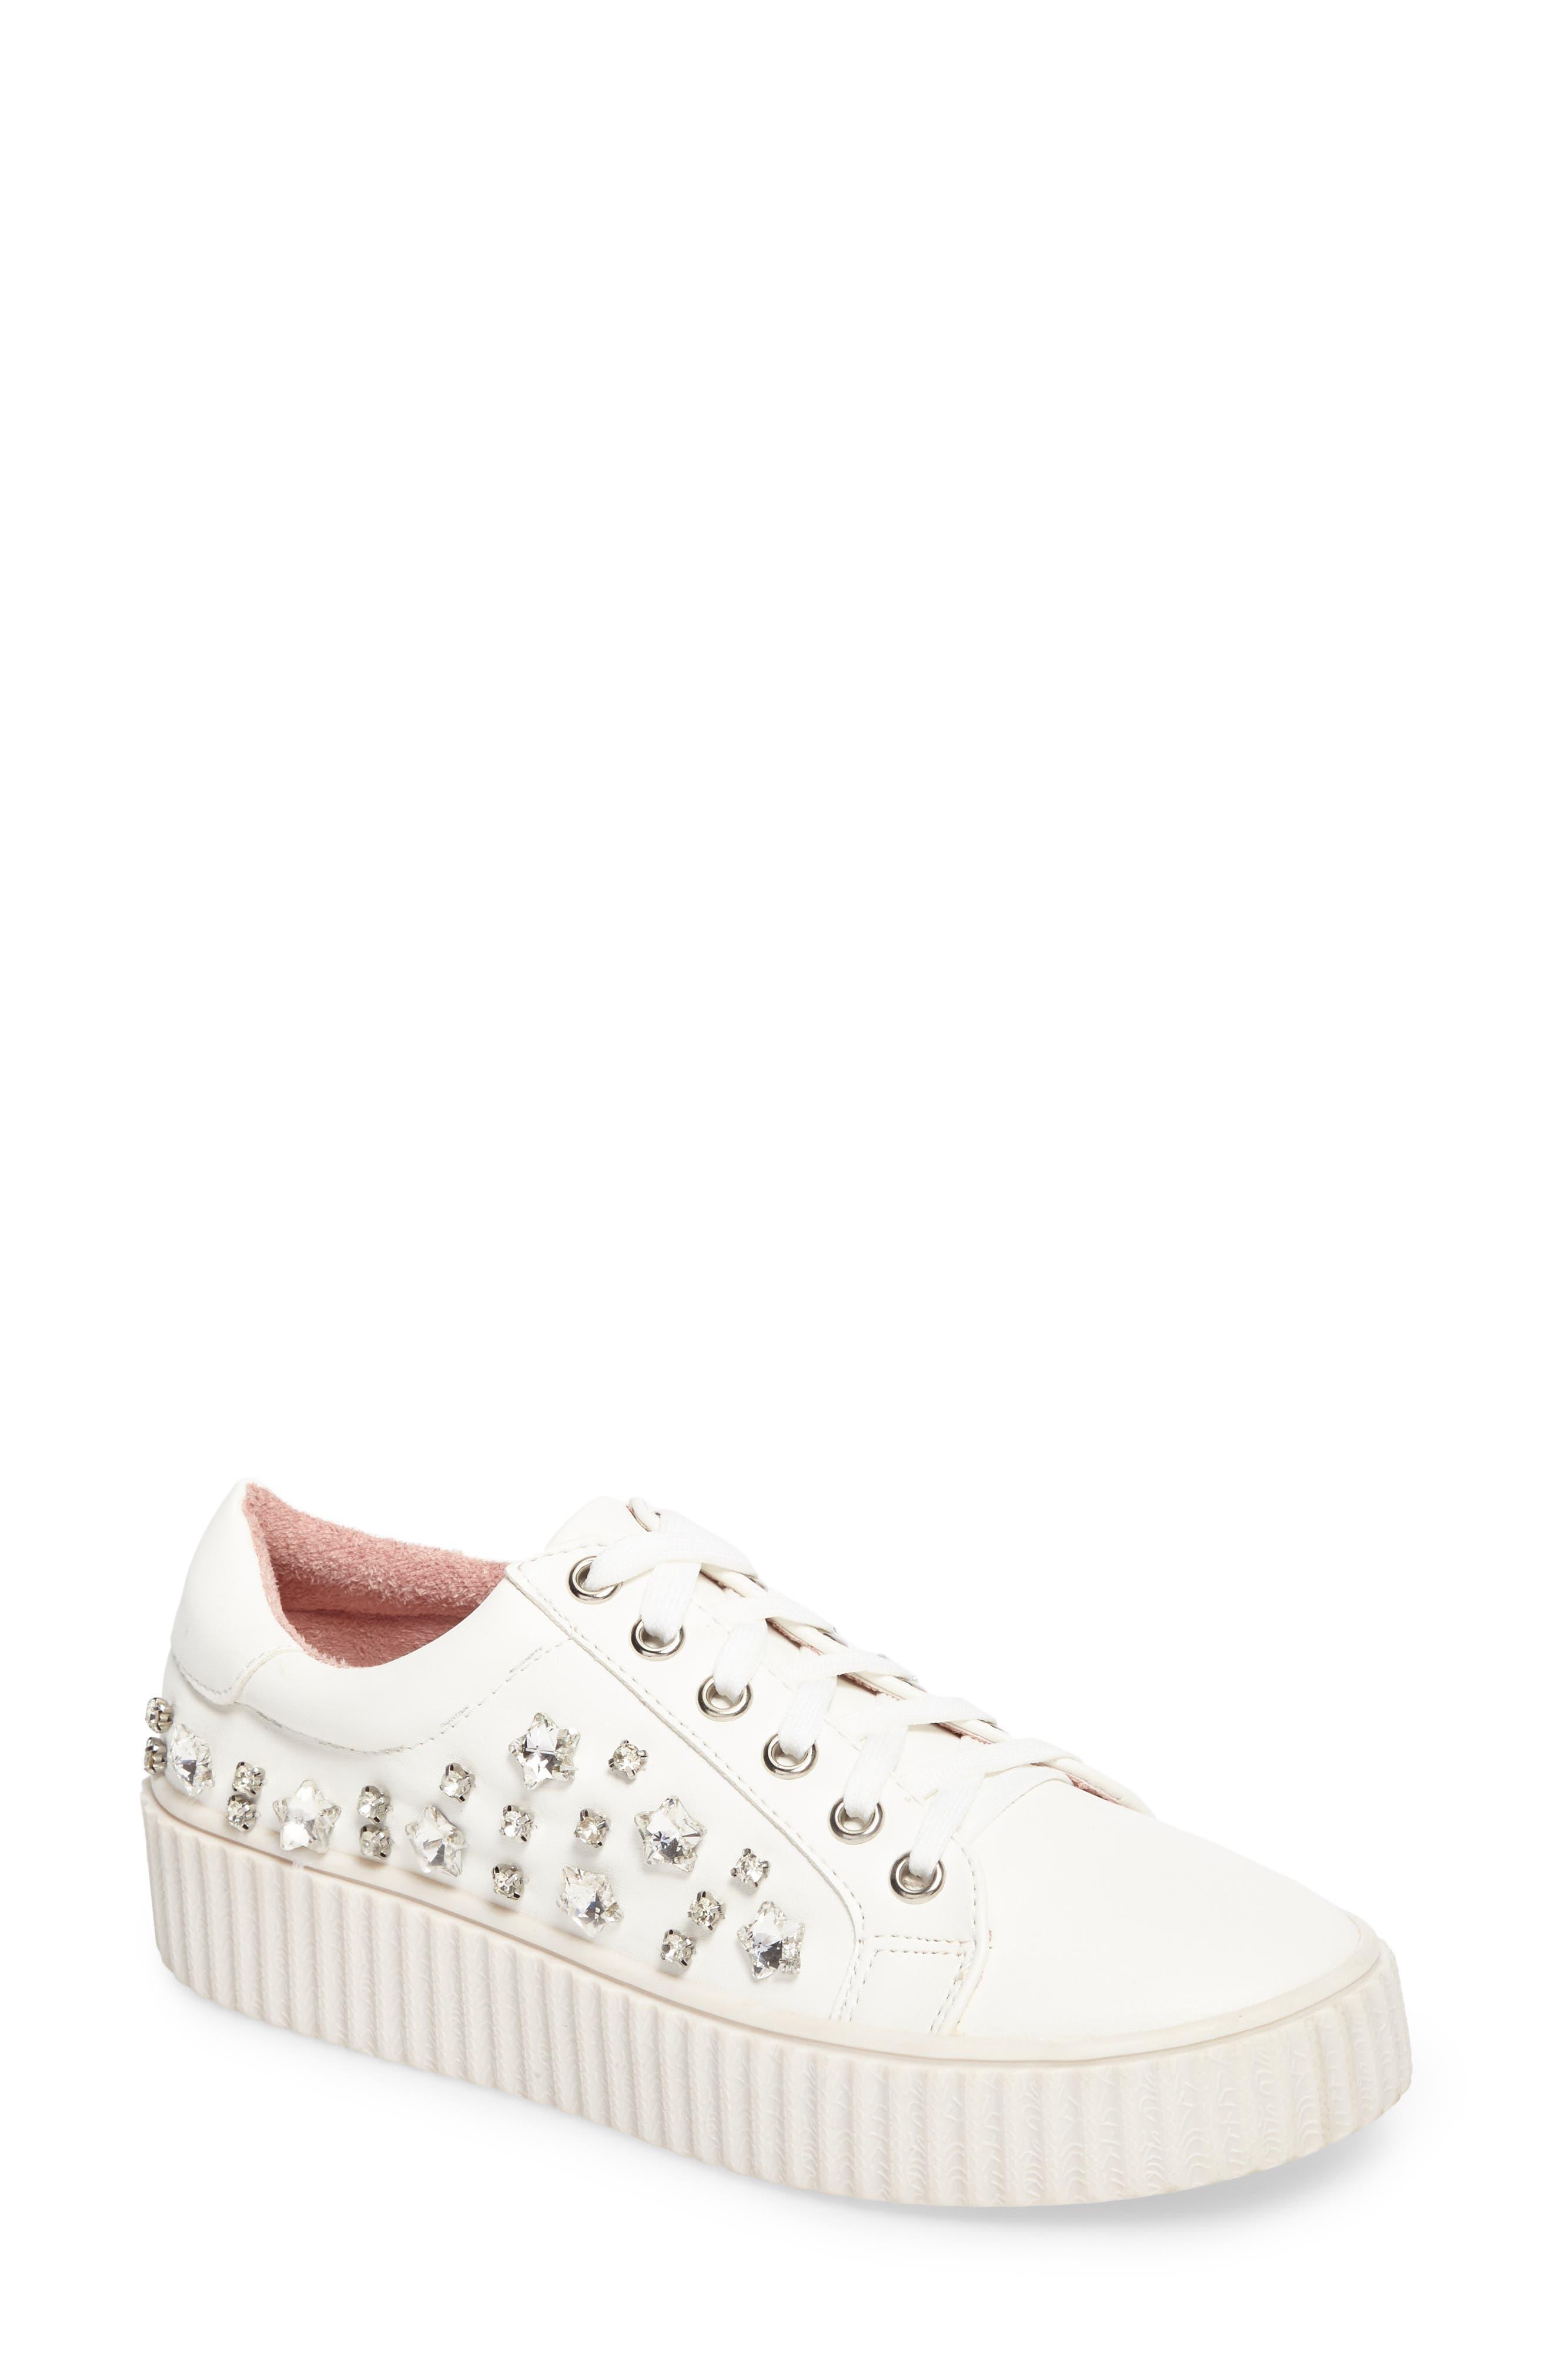 Lauren Lorraine Pam Embellished Platform Sneaker (Women)